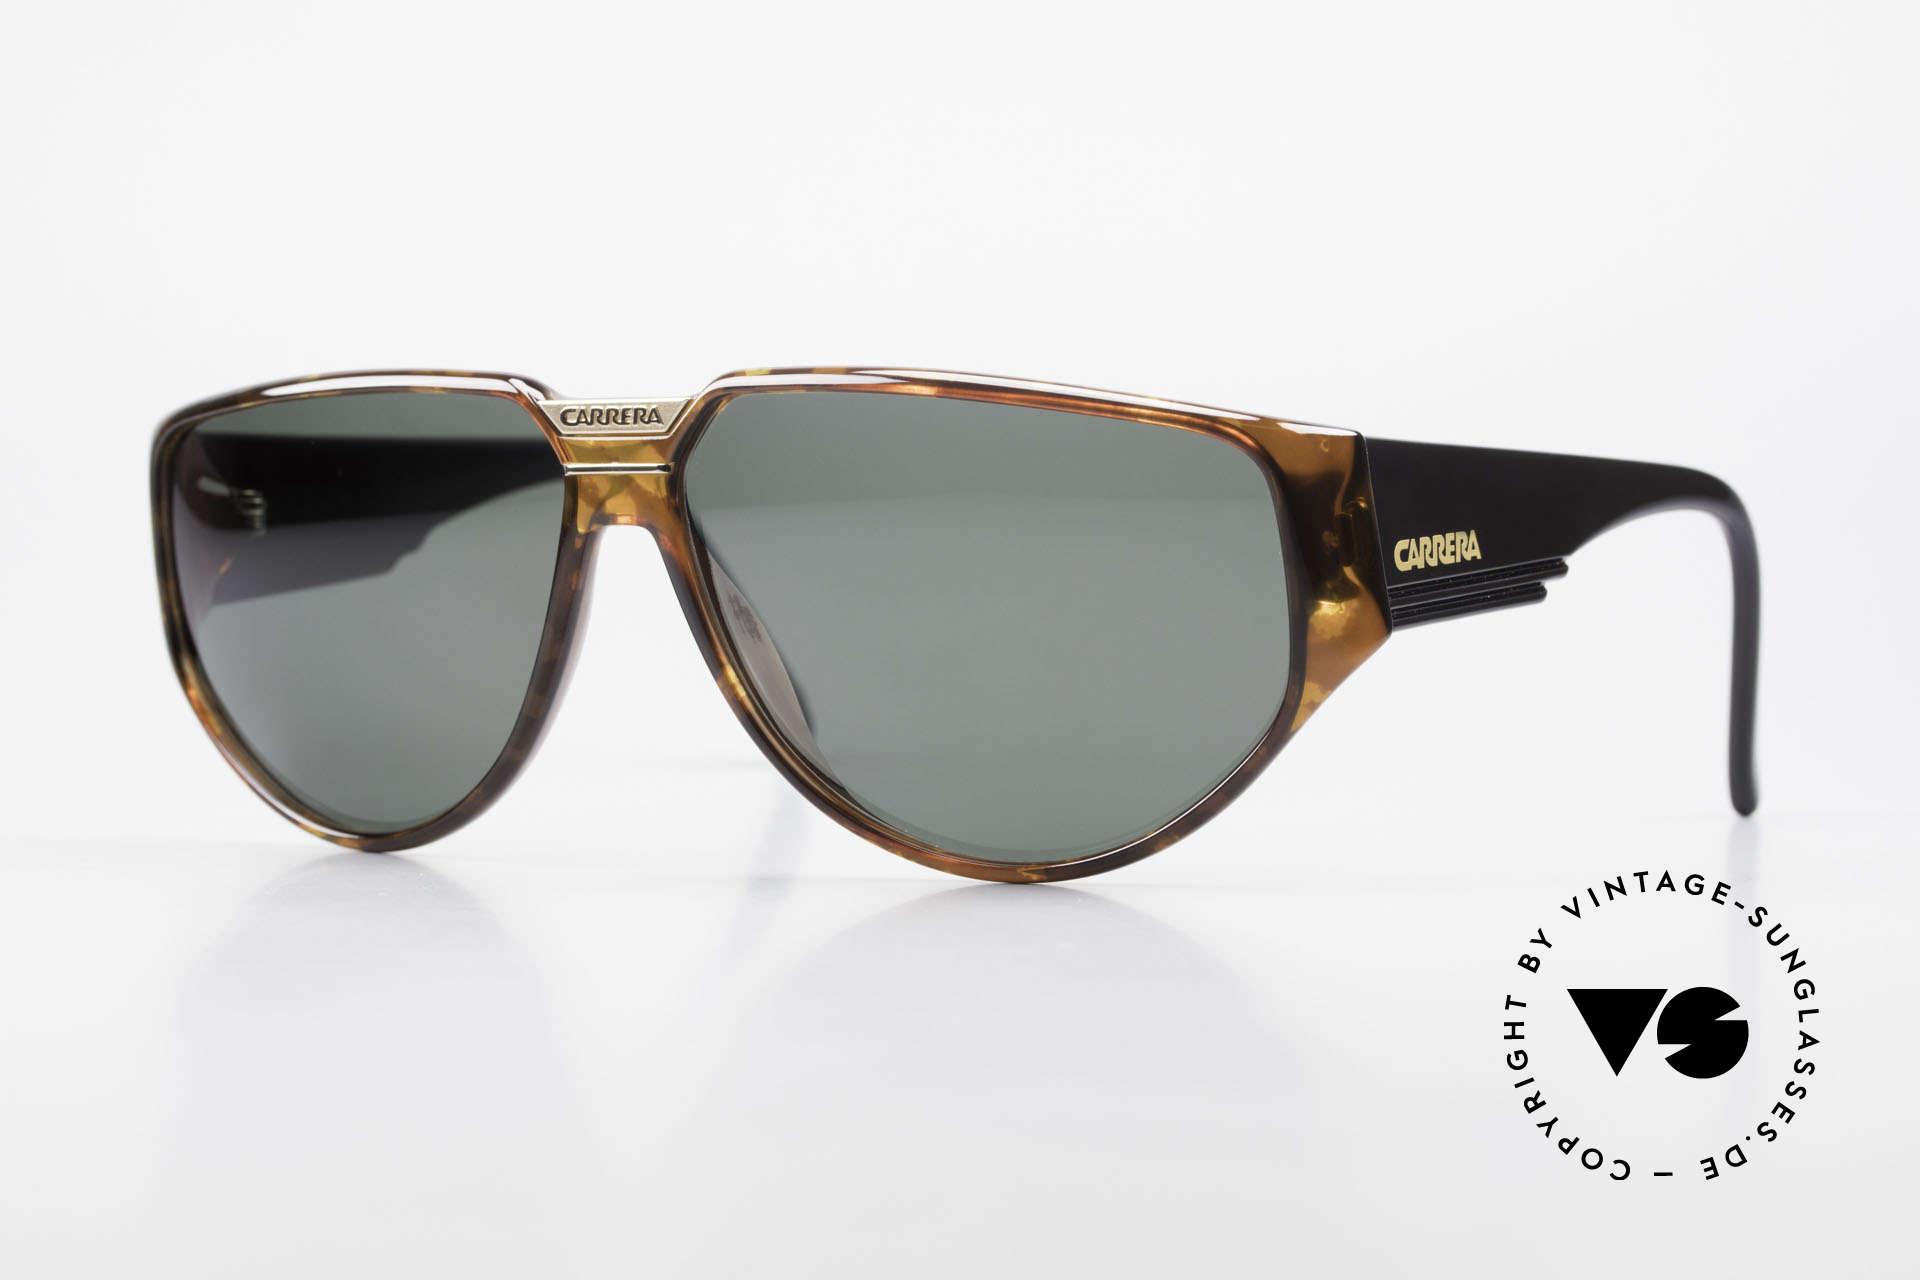 Carrera 5417 Designer 80's Sportsglasses, old, original Carrera sports sunglasses from 1989, Made for Men